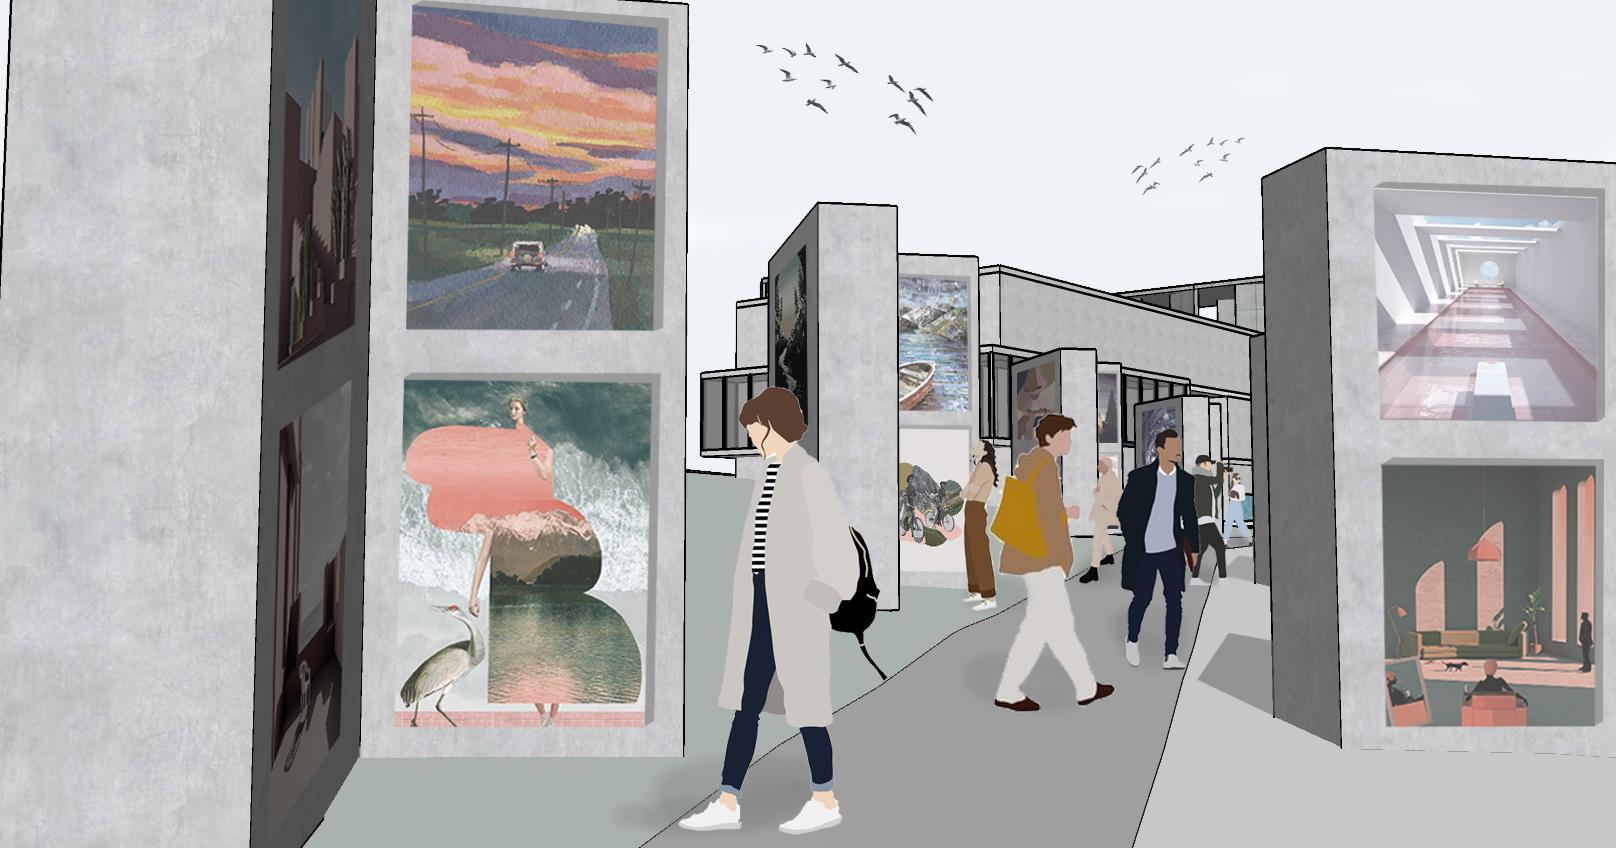 Exhibition Center Mural Lane